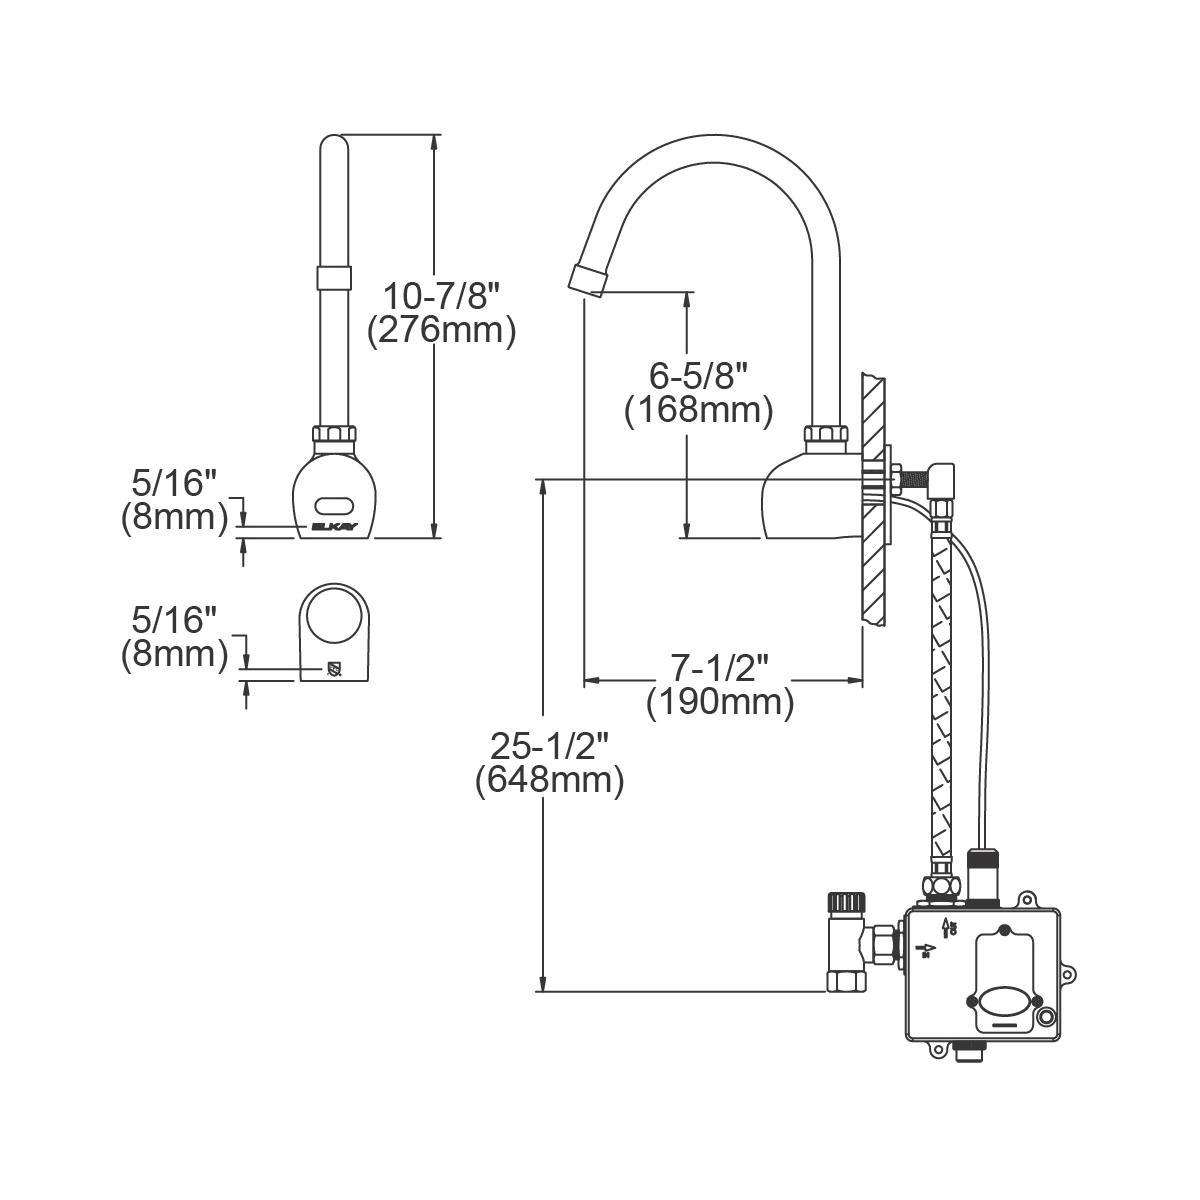 Elkay LKB722C Commercial Electronic Sensor Scrub/Handwash Battery Powered Wall Mount Faucet, Chrome by Elkay